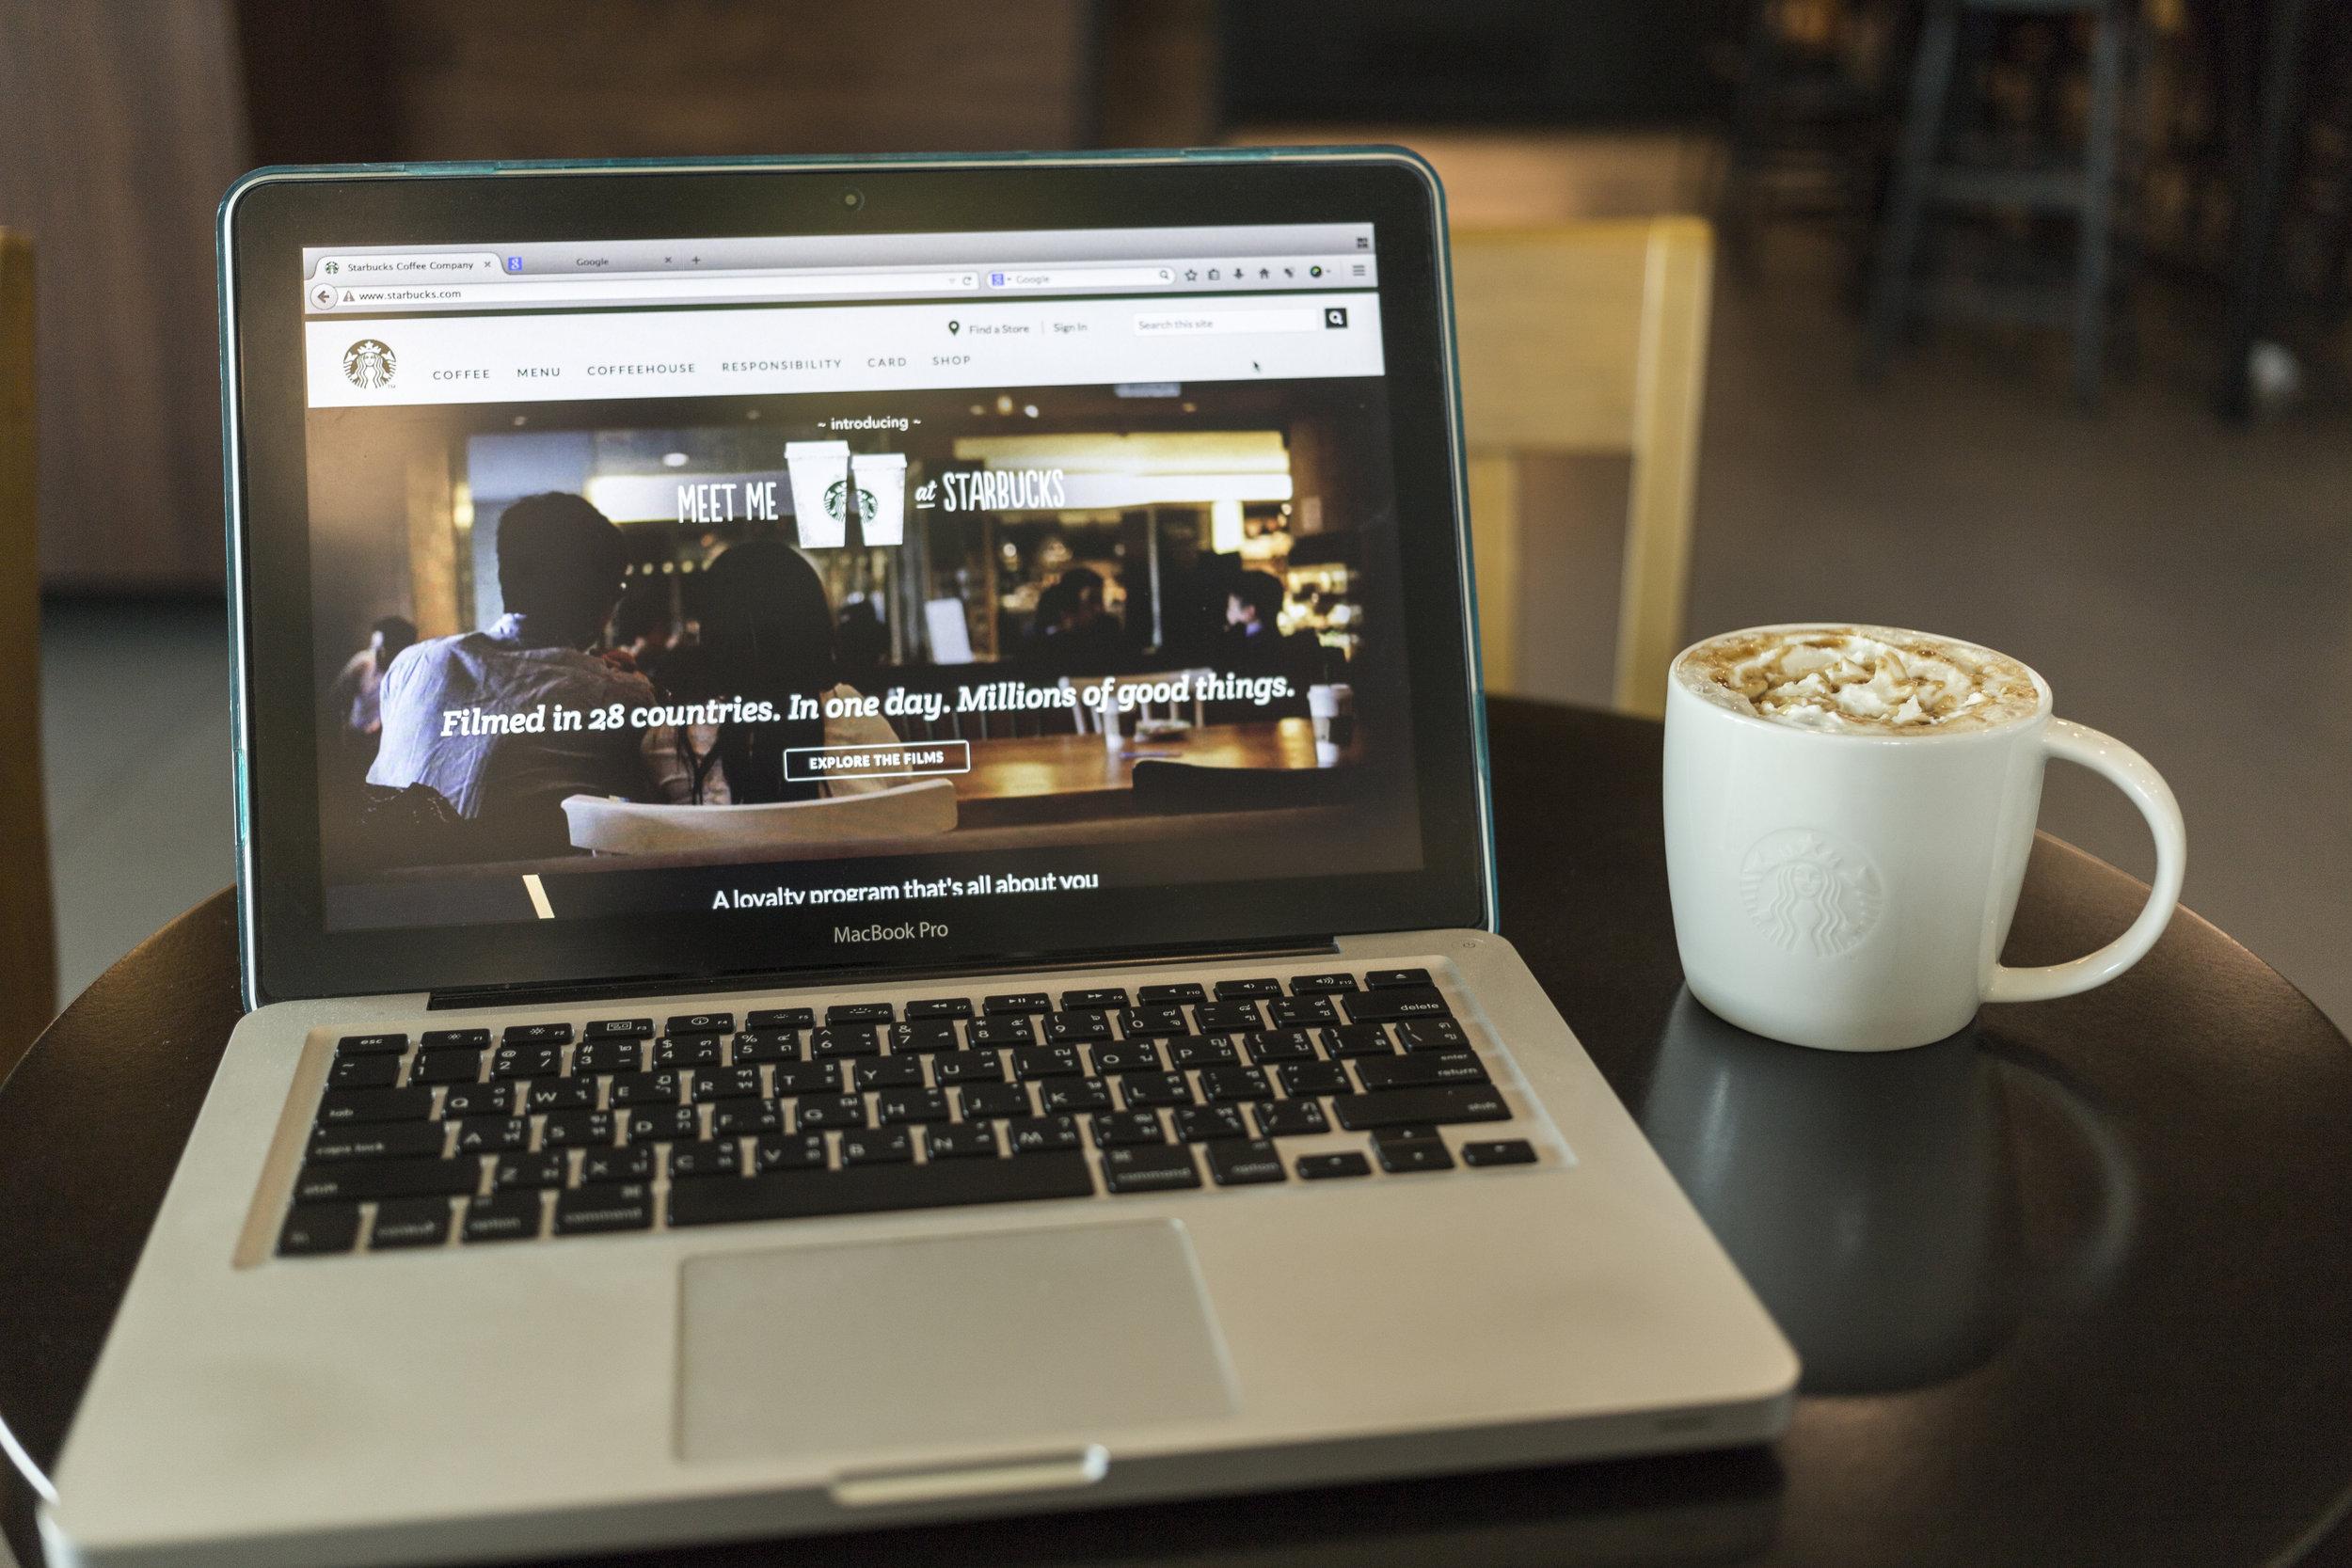 chiang-mai-thailand-october-02-2014-starbucks-coffee-caramel-latte-and-apple-laptop-open-starbucks-website-on-monitor_Sw51XJdhGl.jpg